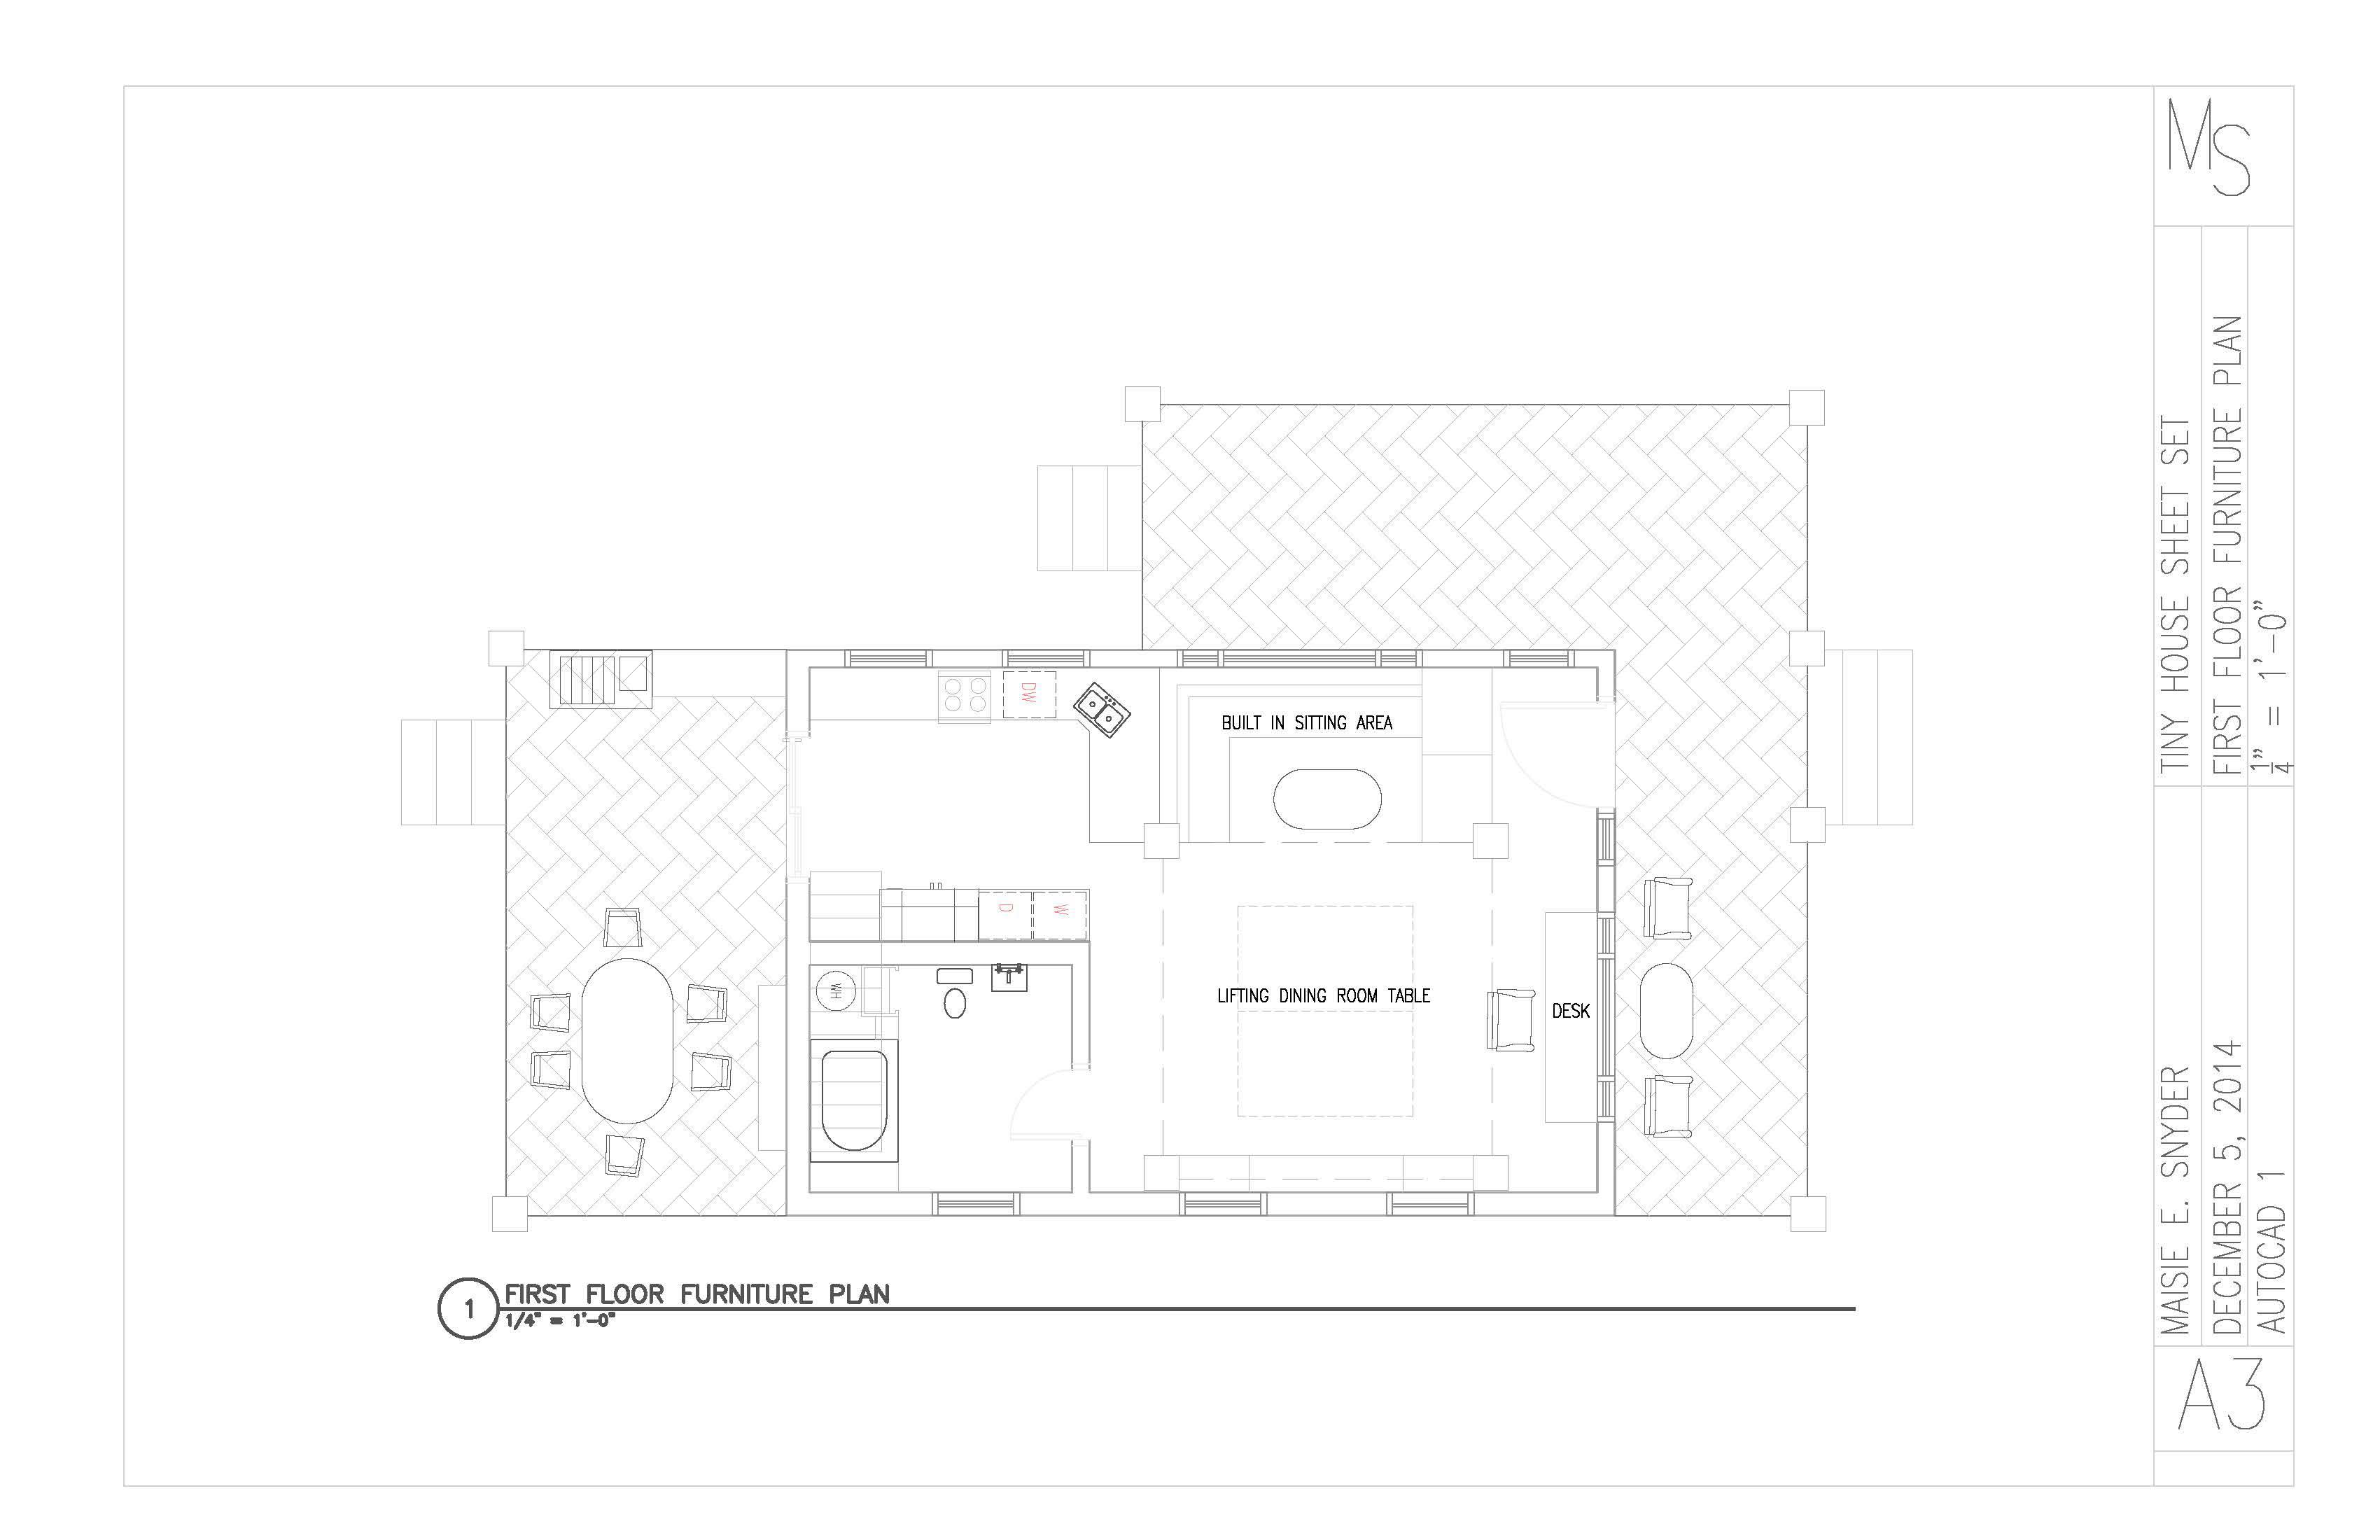 Maisie Snyder - AutoCAD Architecture: Tiny House Sheet Set